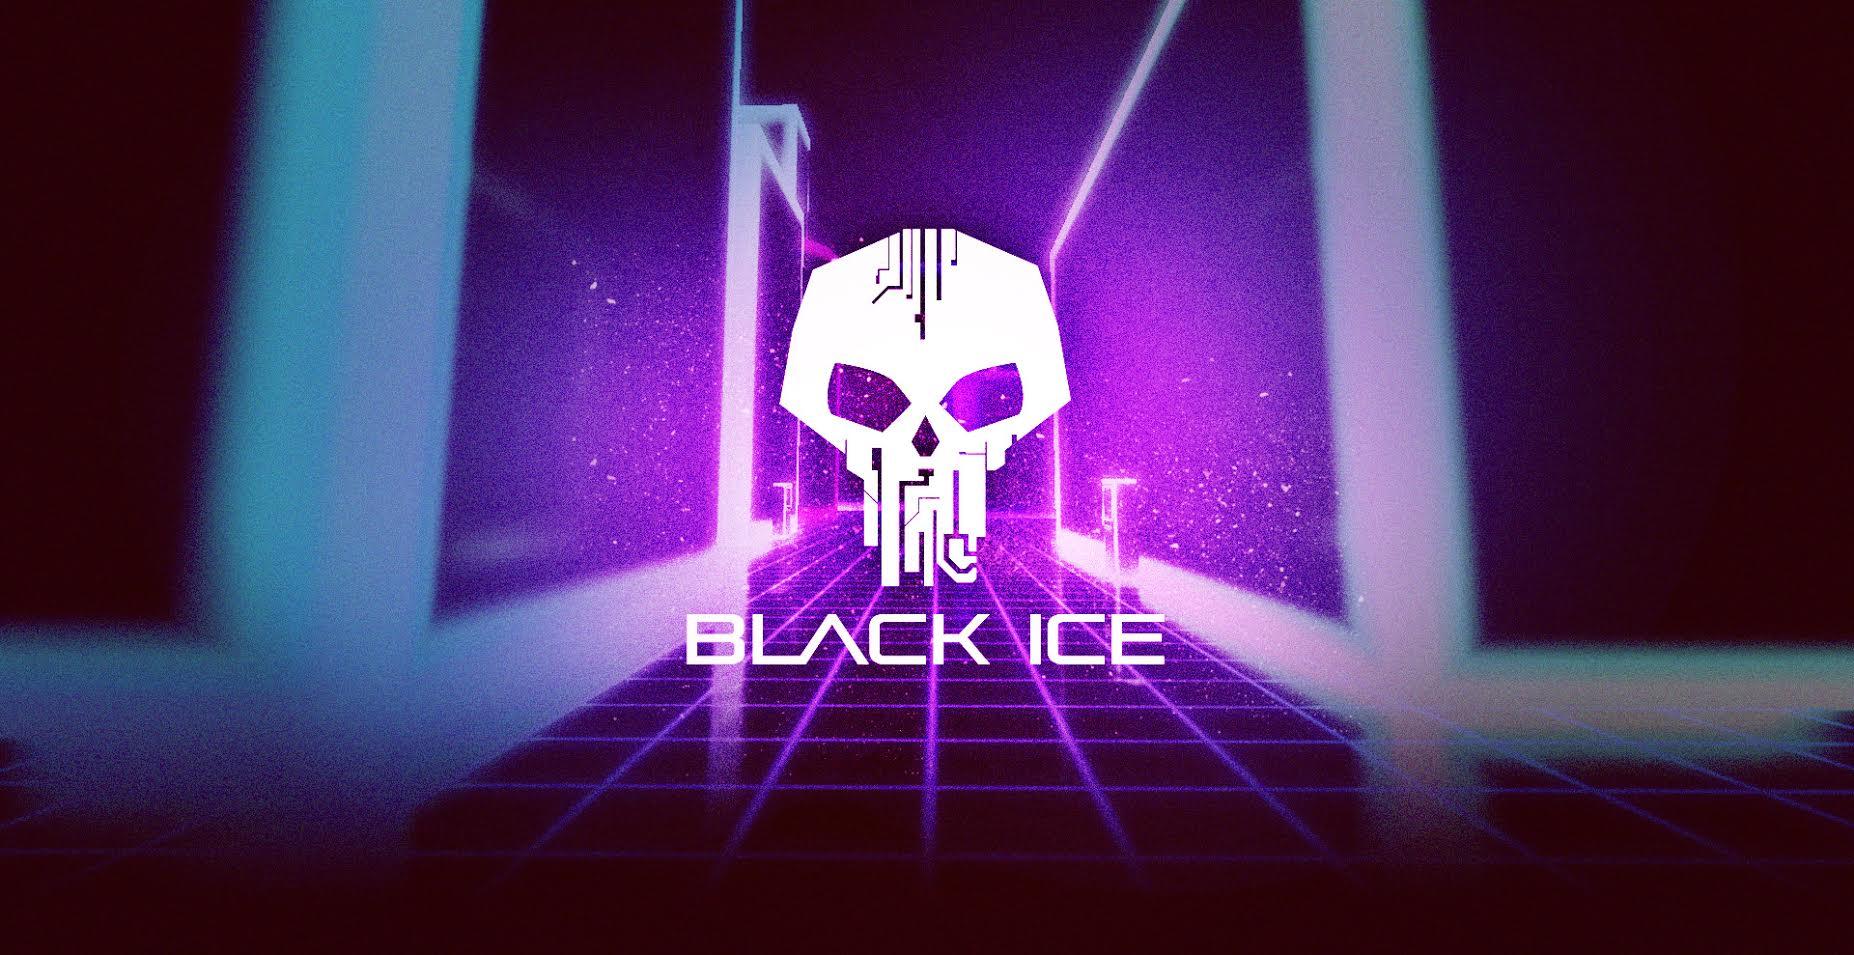 black ice game